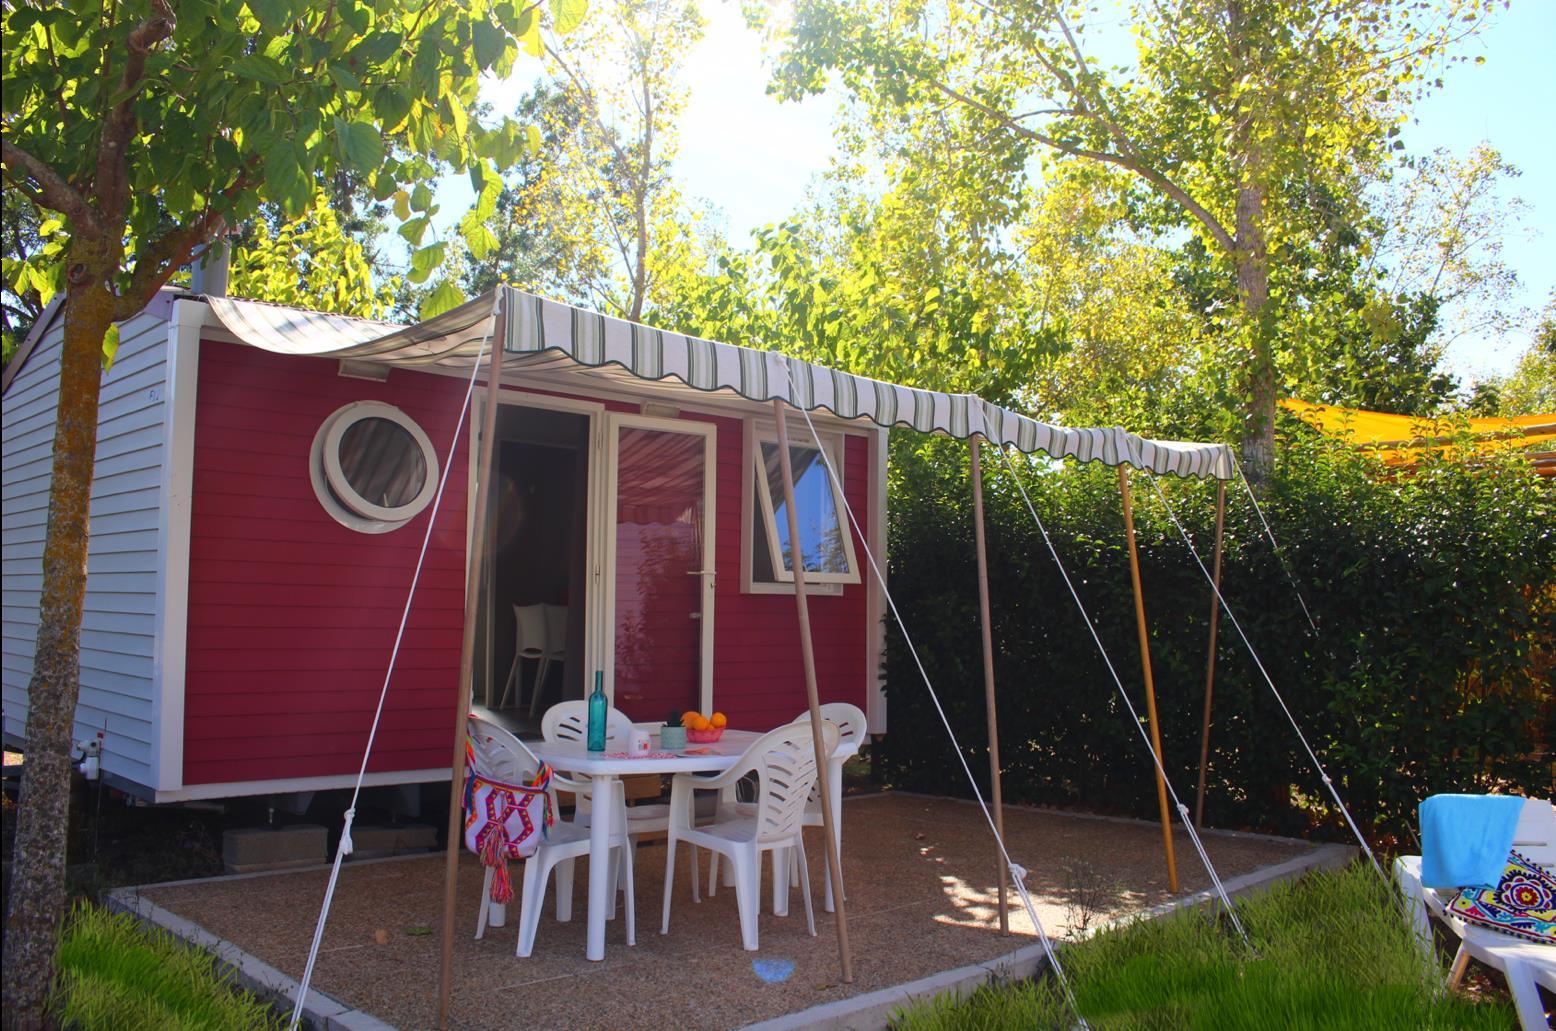 Location - El Pequeno, Confort - Dimanche - 1 Chambre - Camping L'Air Marin